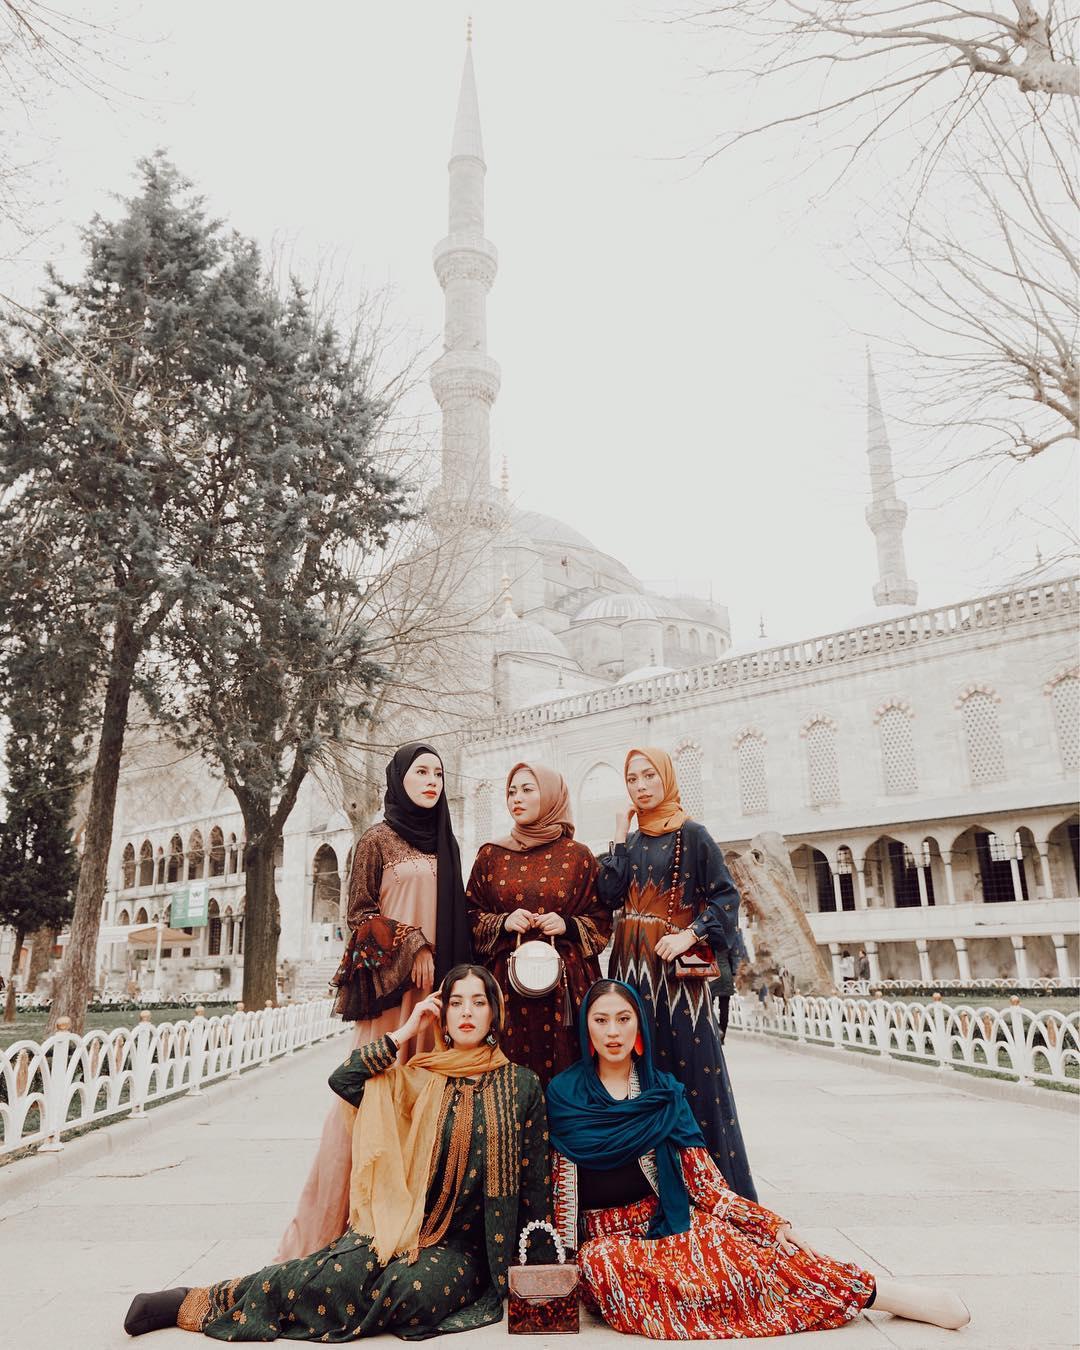 8 Gaya Fesyen Elegan Tasya Farasya Liburan ke Turki. Bak